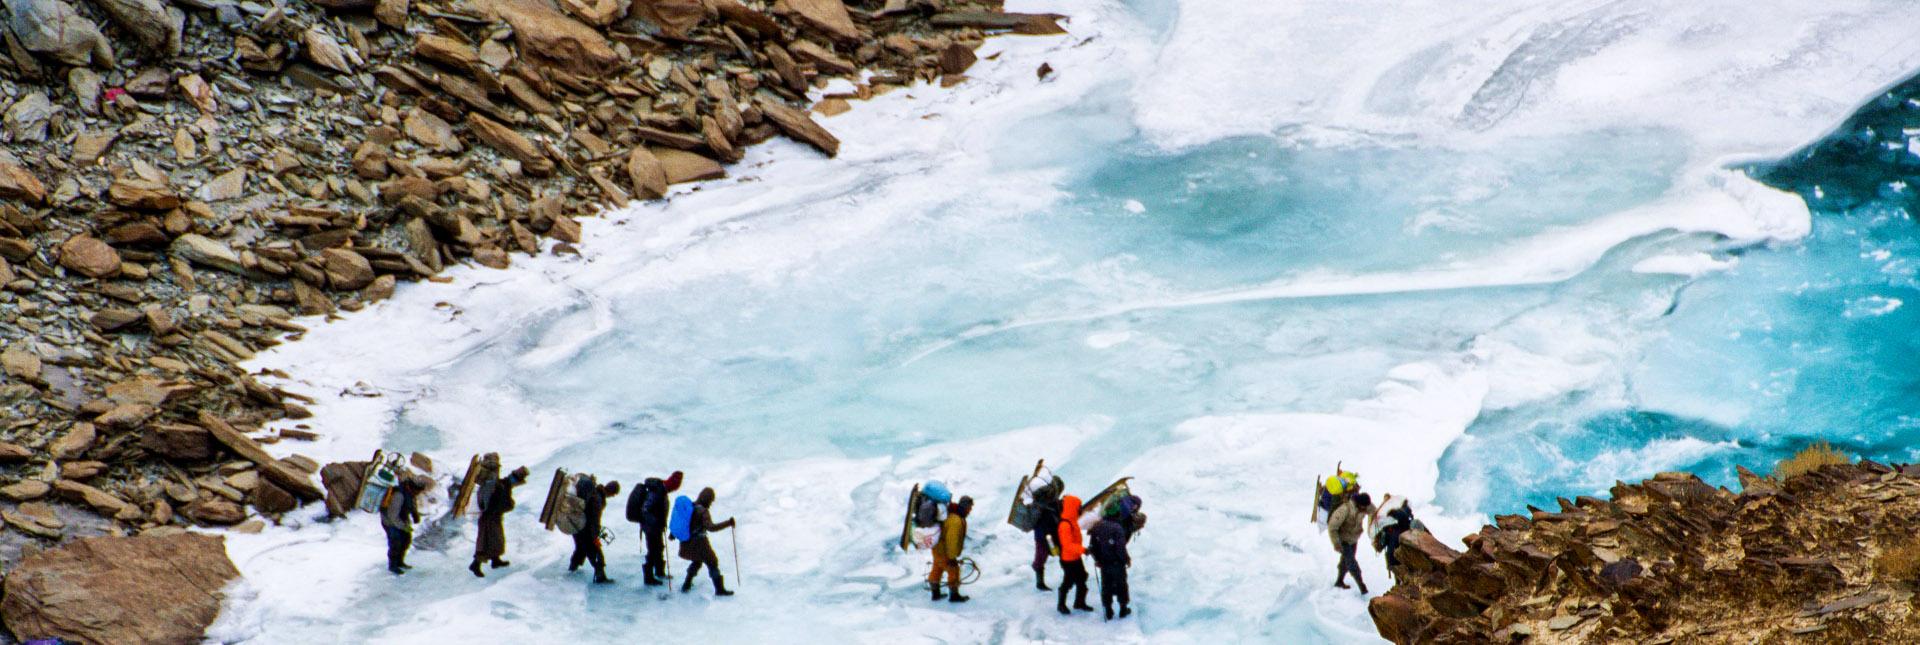 Chadar Trek – traversing a frozen Zanskar river